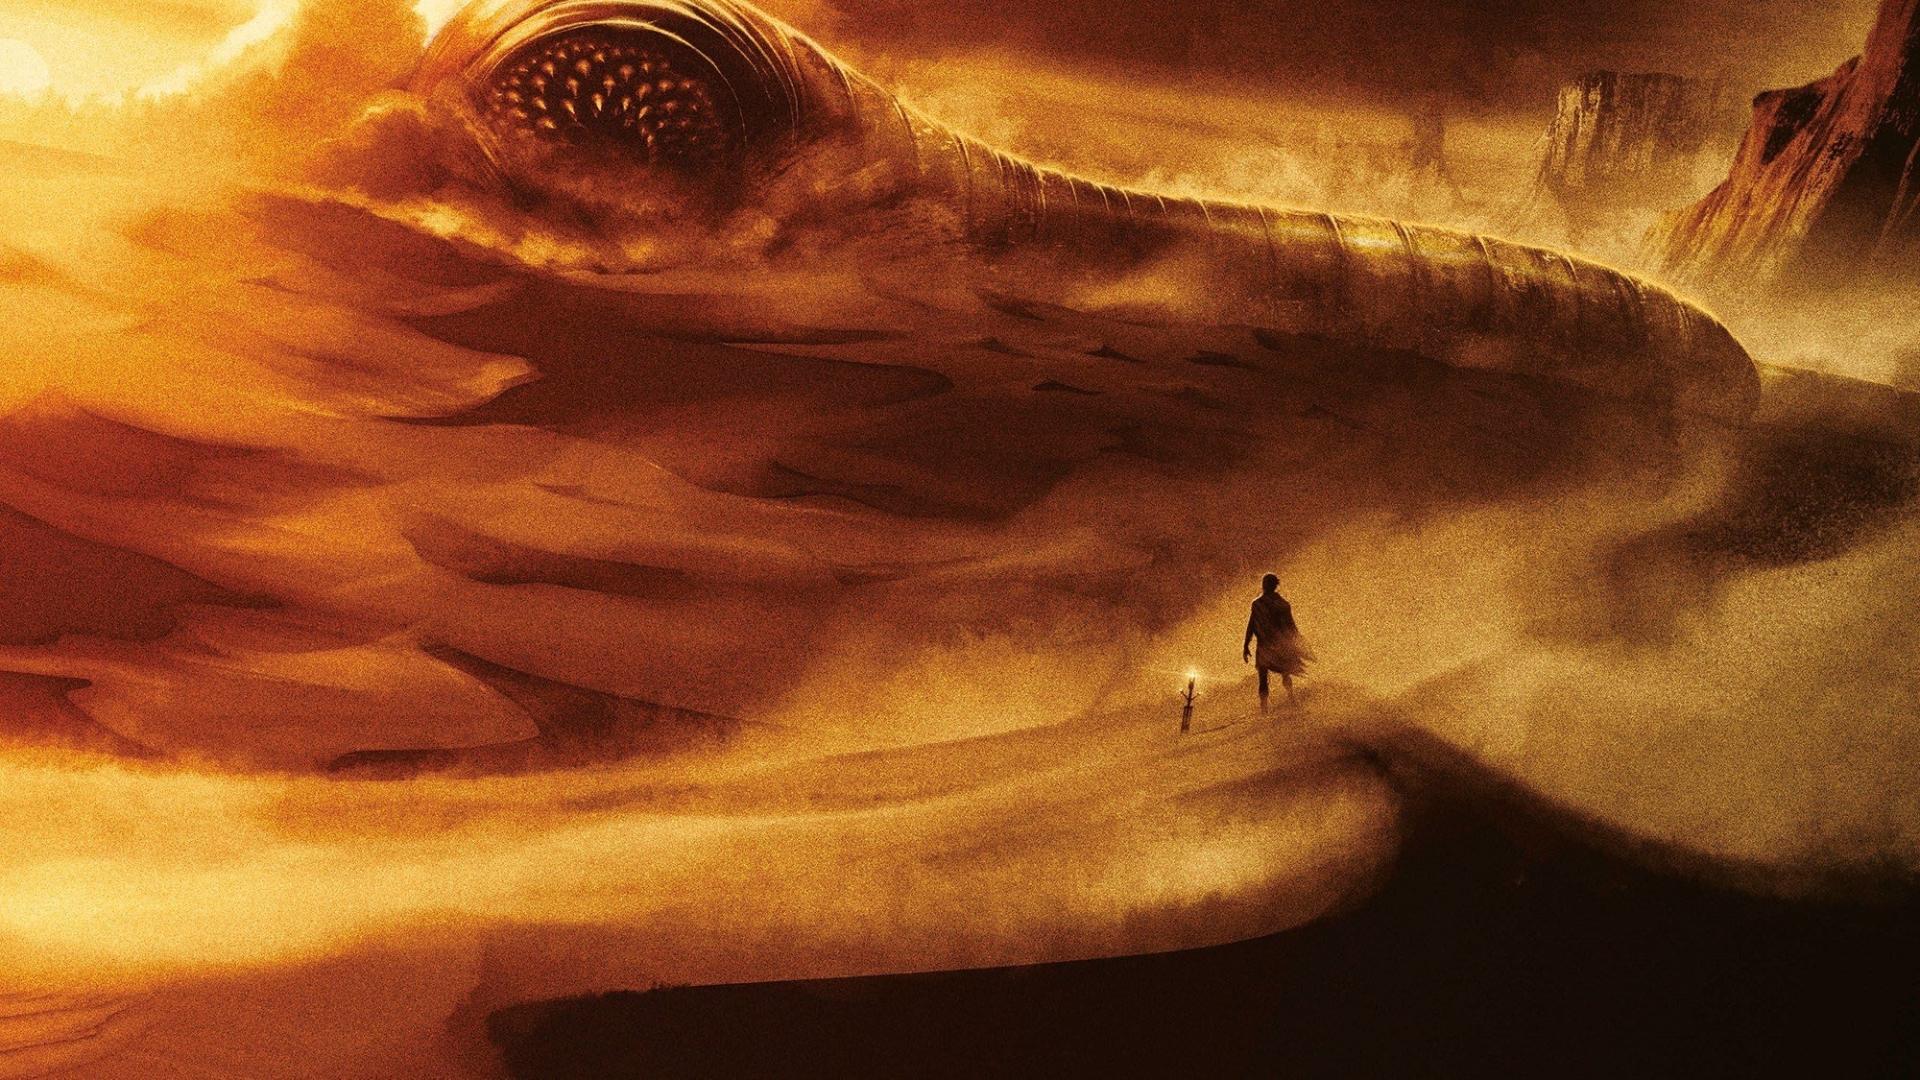 1920x1080 Dune Movie Concept Art 2020 1080P Laptop Full HD 1920x1080